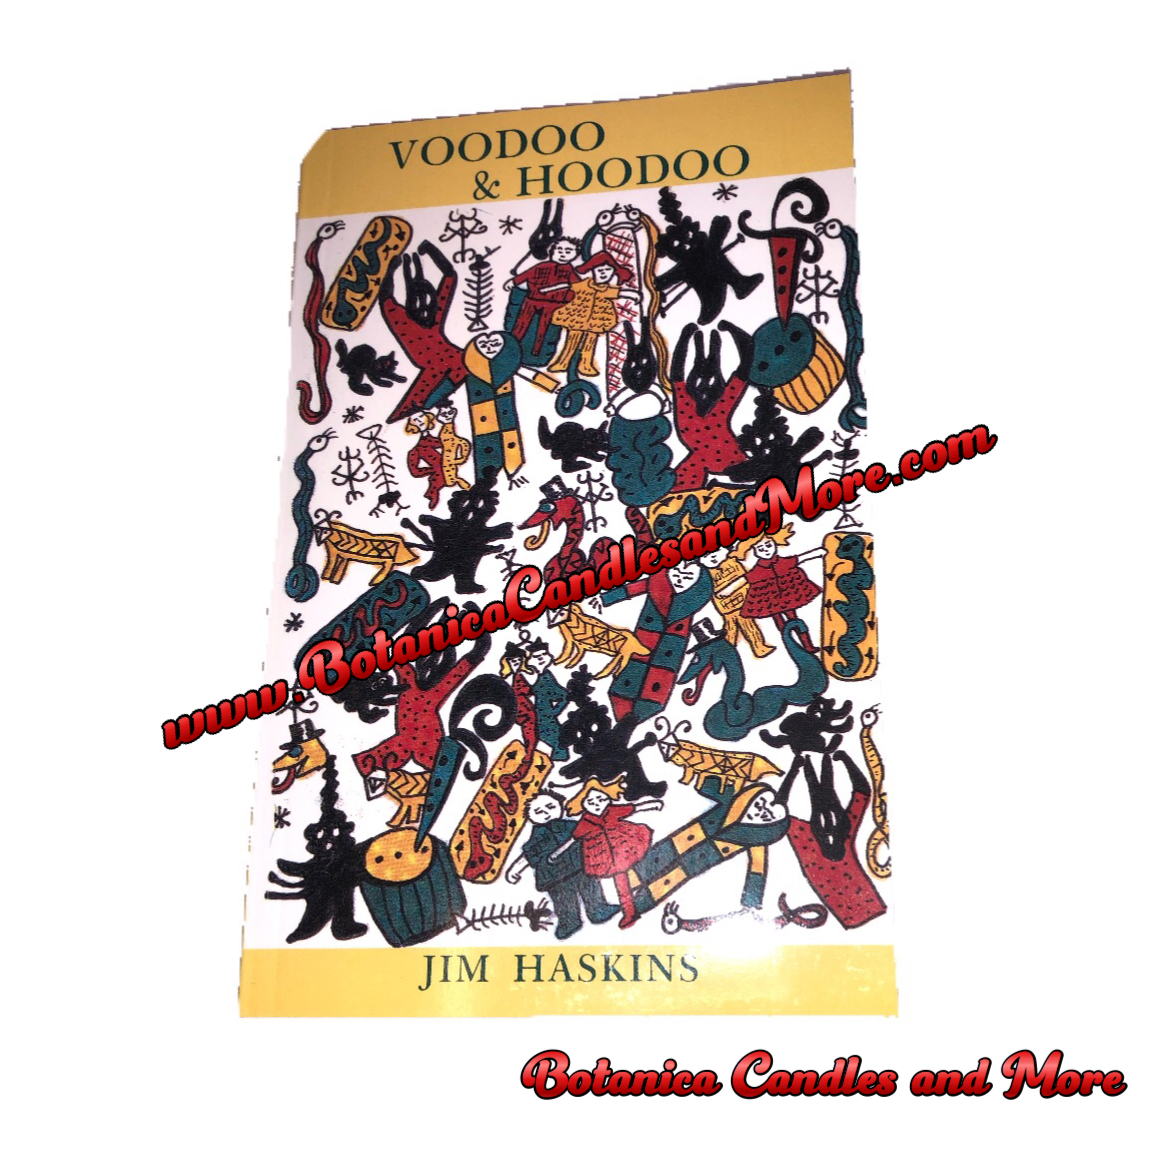 Voodoo Hoodoo Book — BOTANICA CANDLES AND MORE